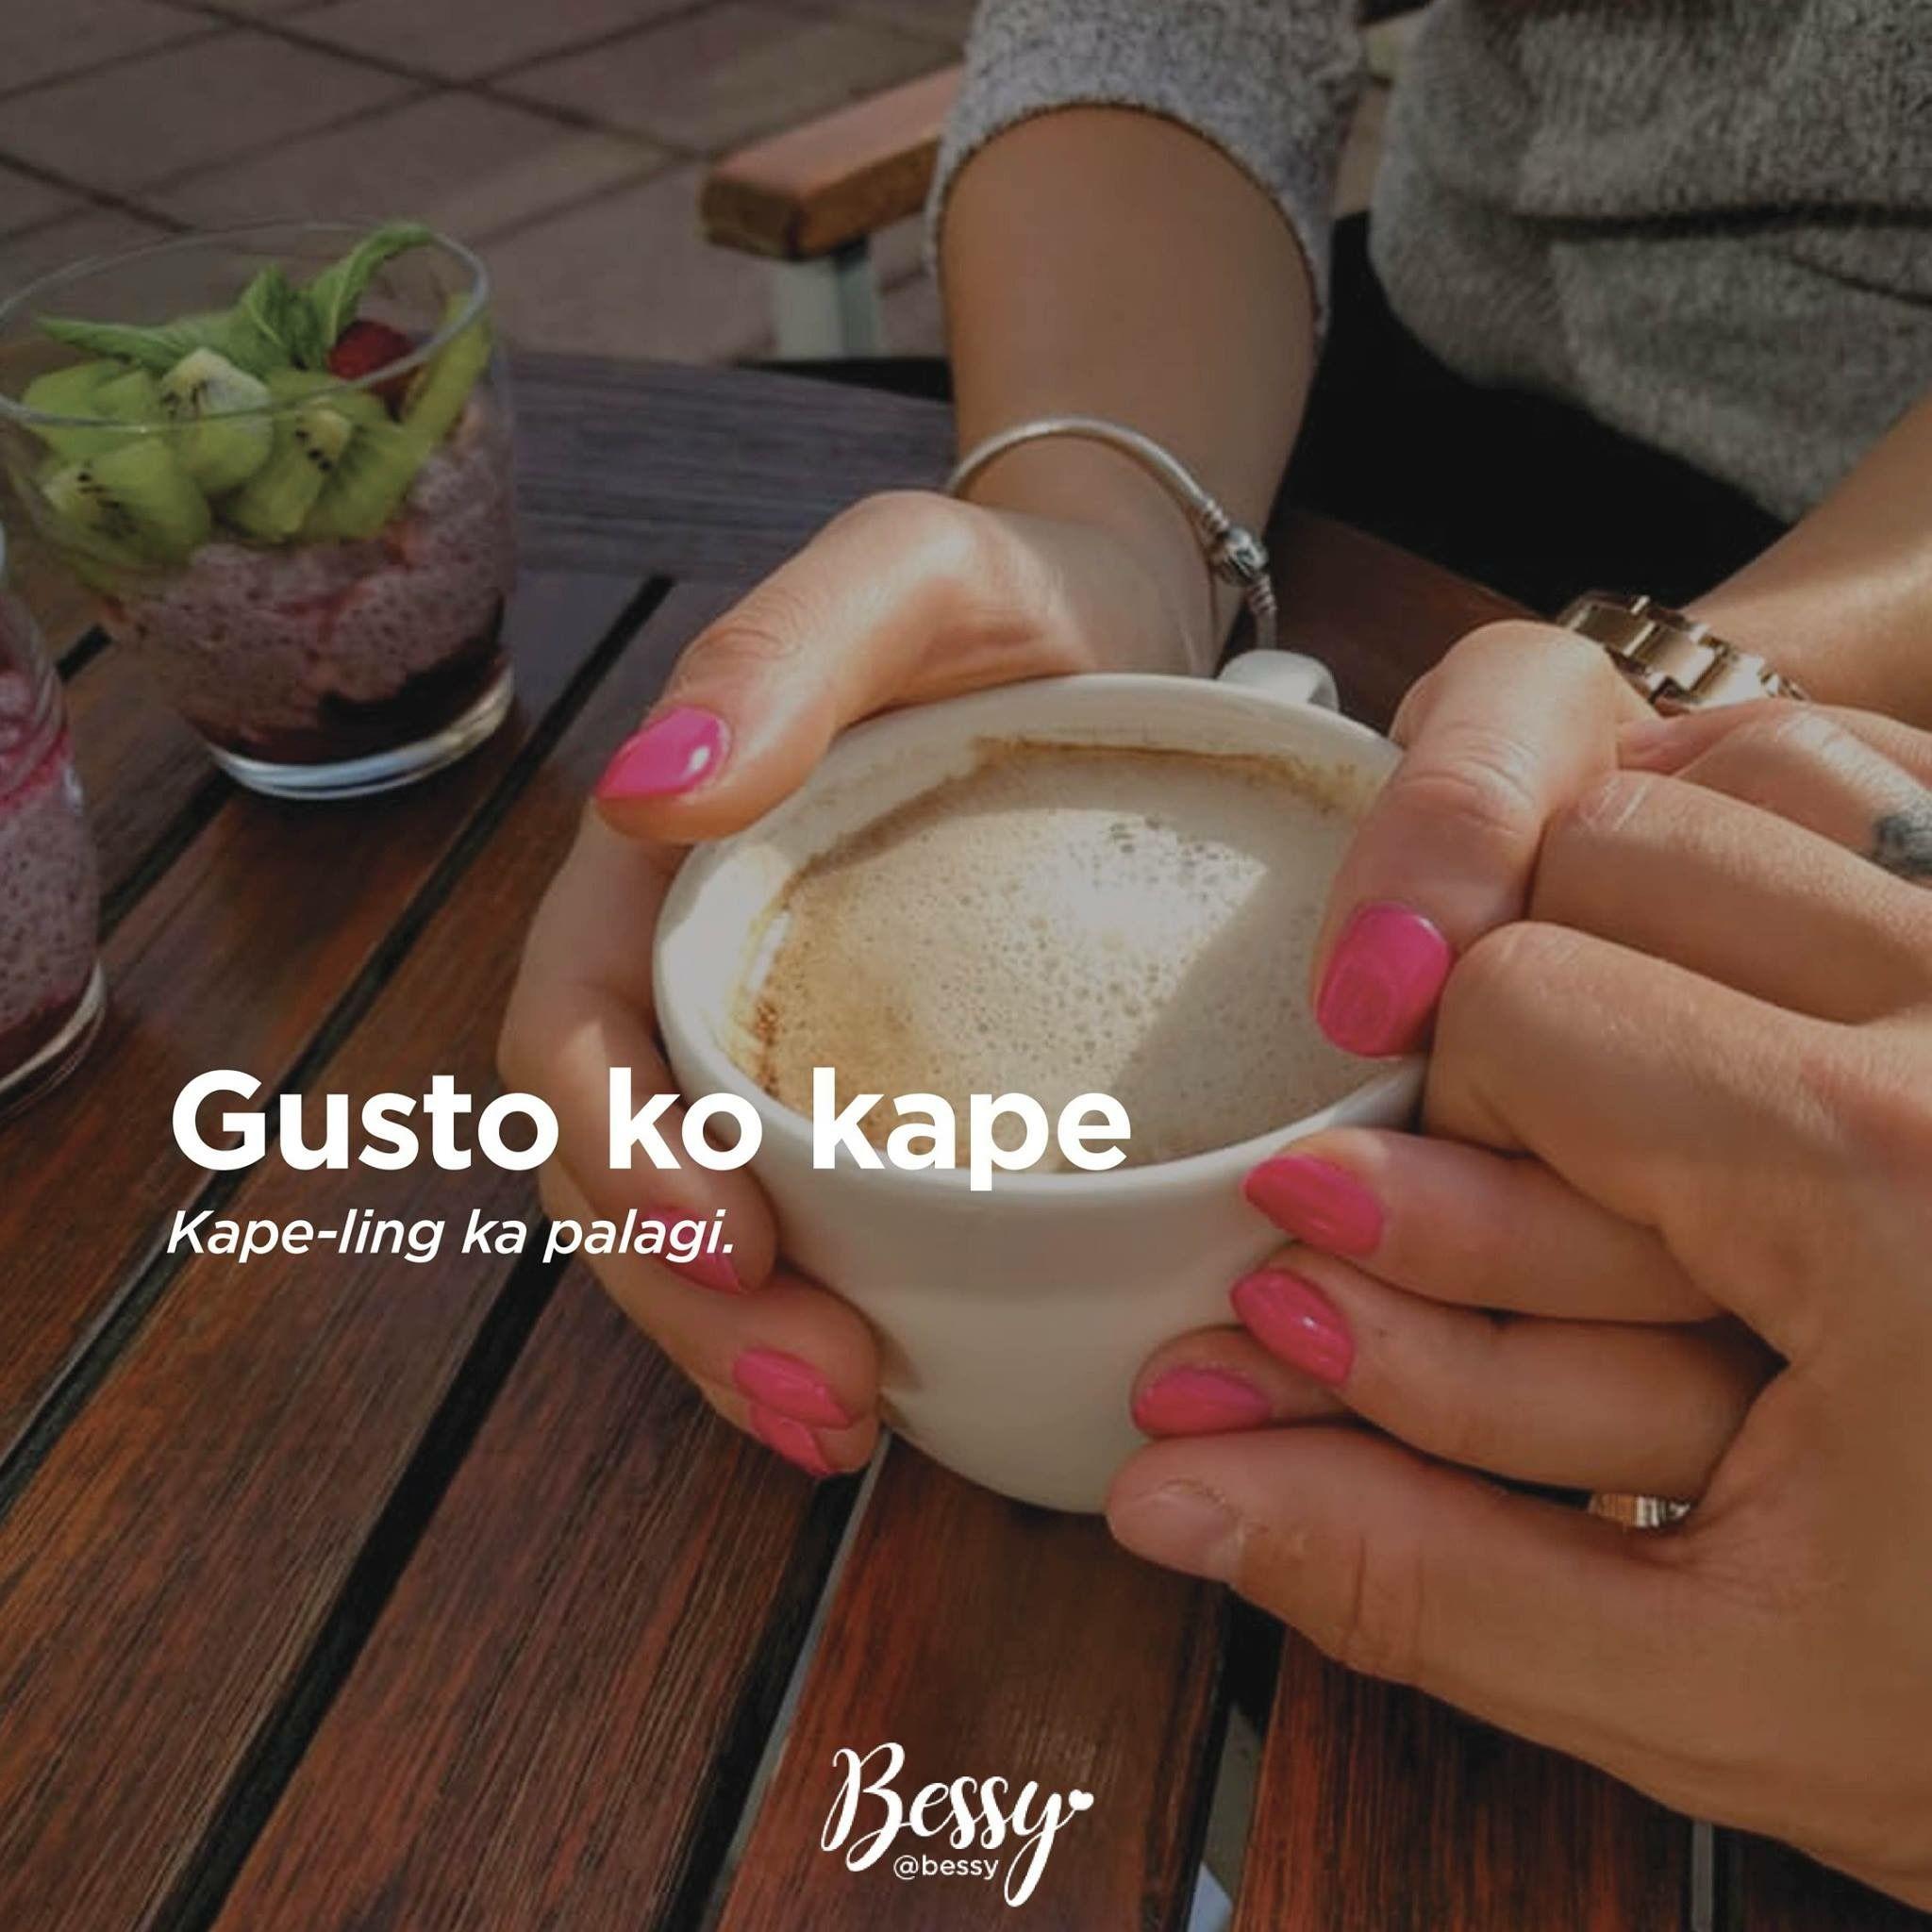 pin by rea yagin on hugot ✌ hugot filipino quotes hugot lines